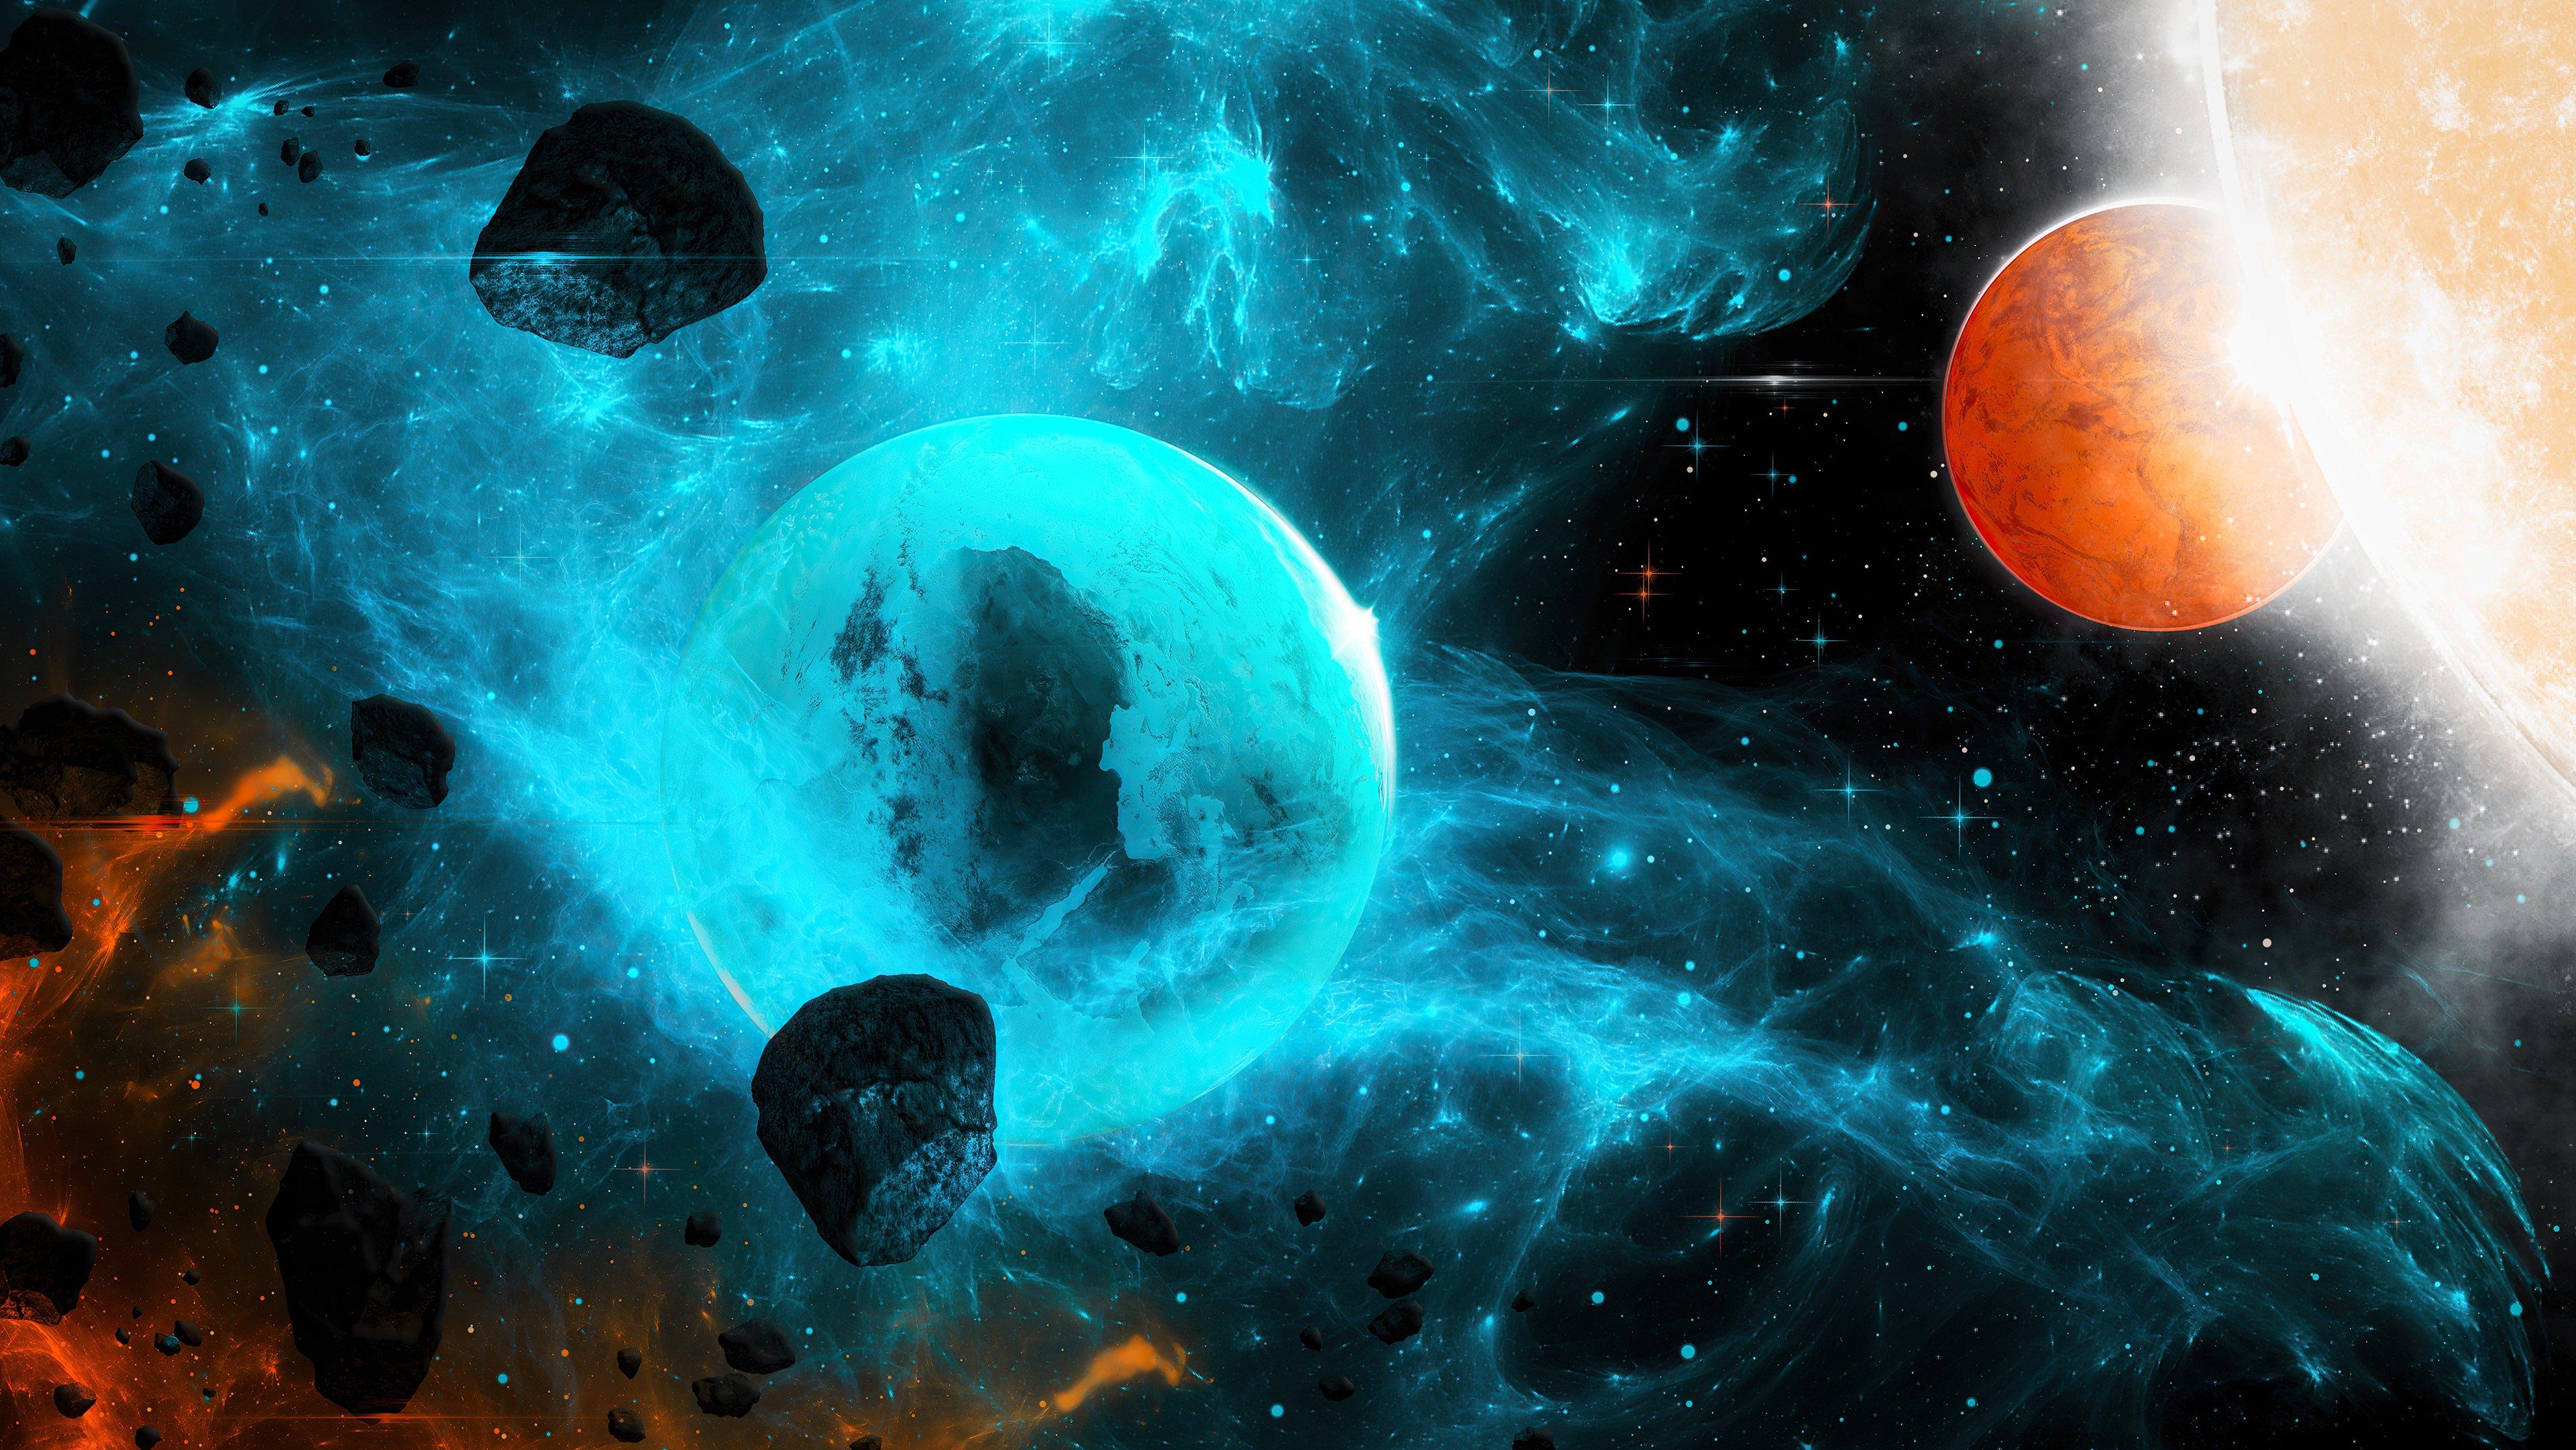 Wallpaper Planets